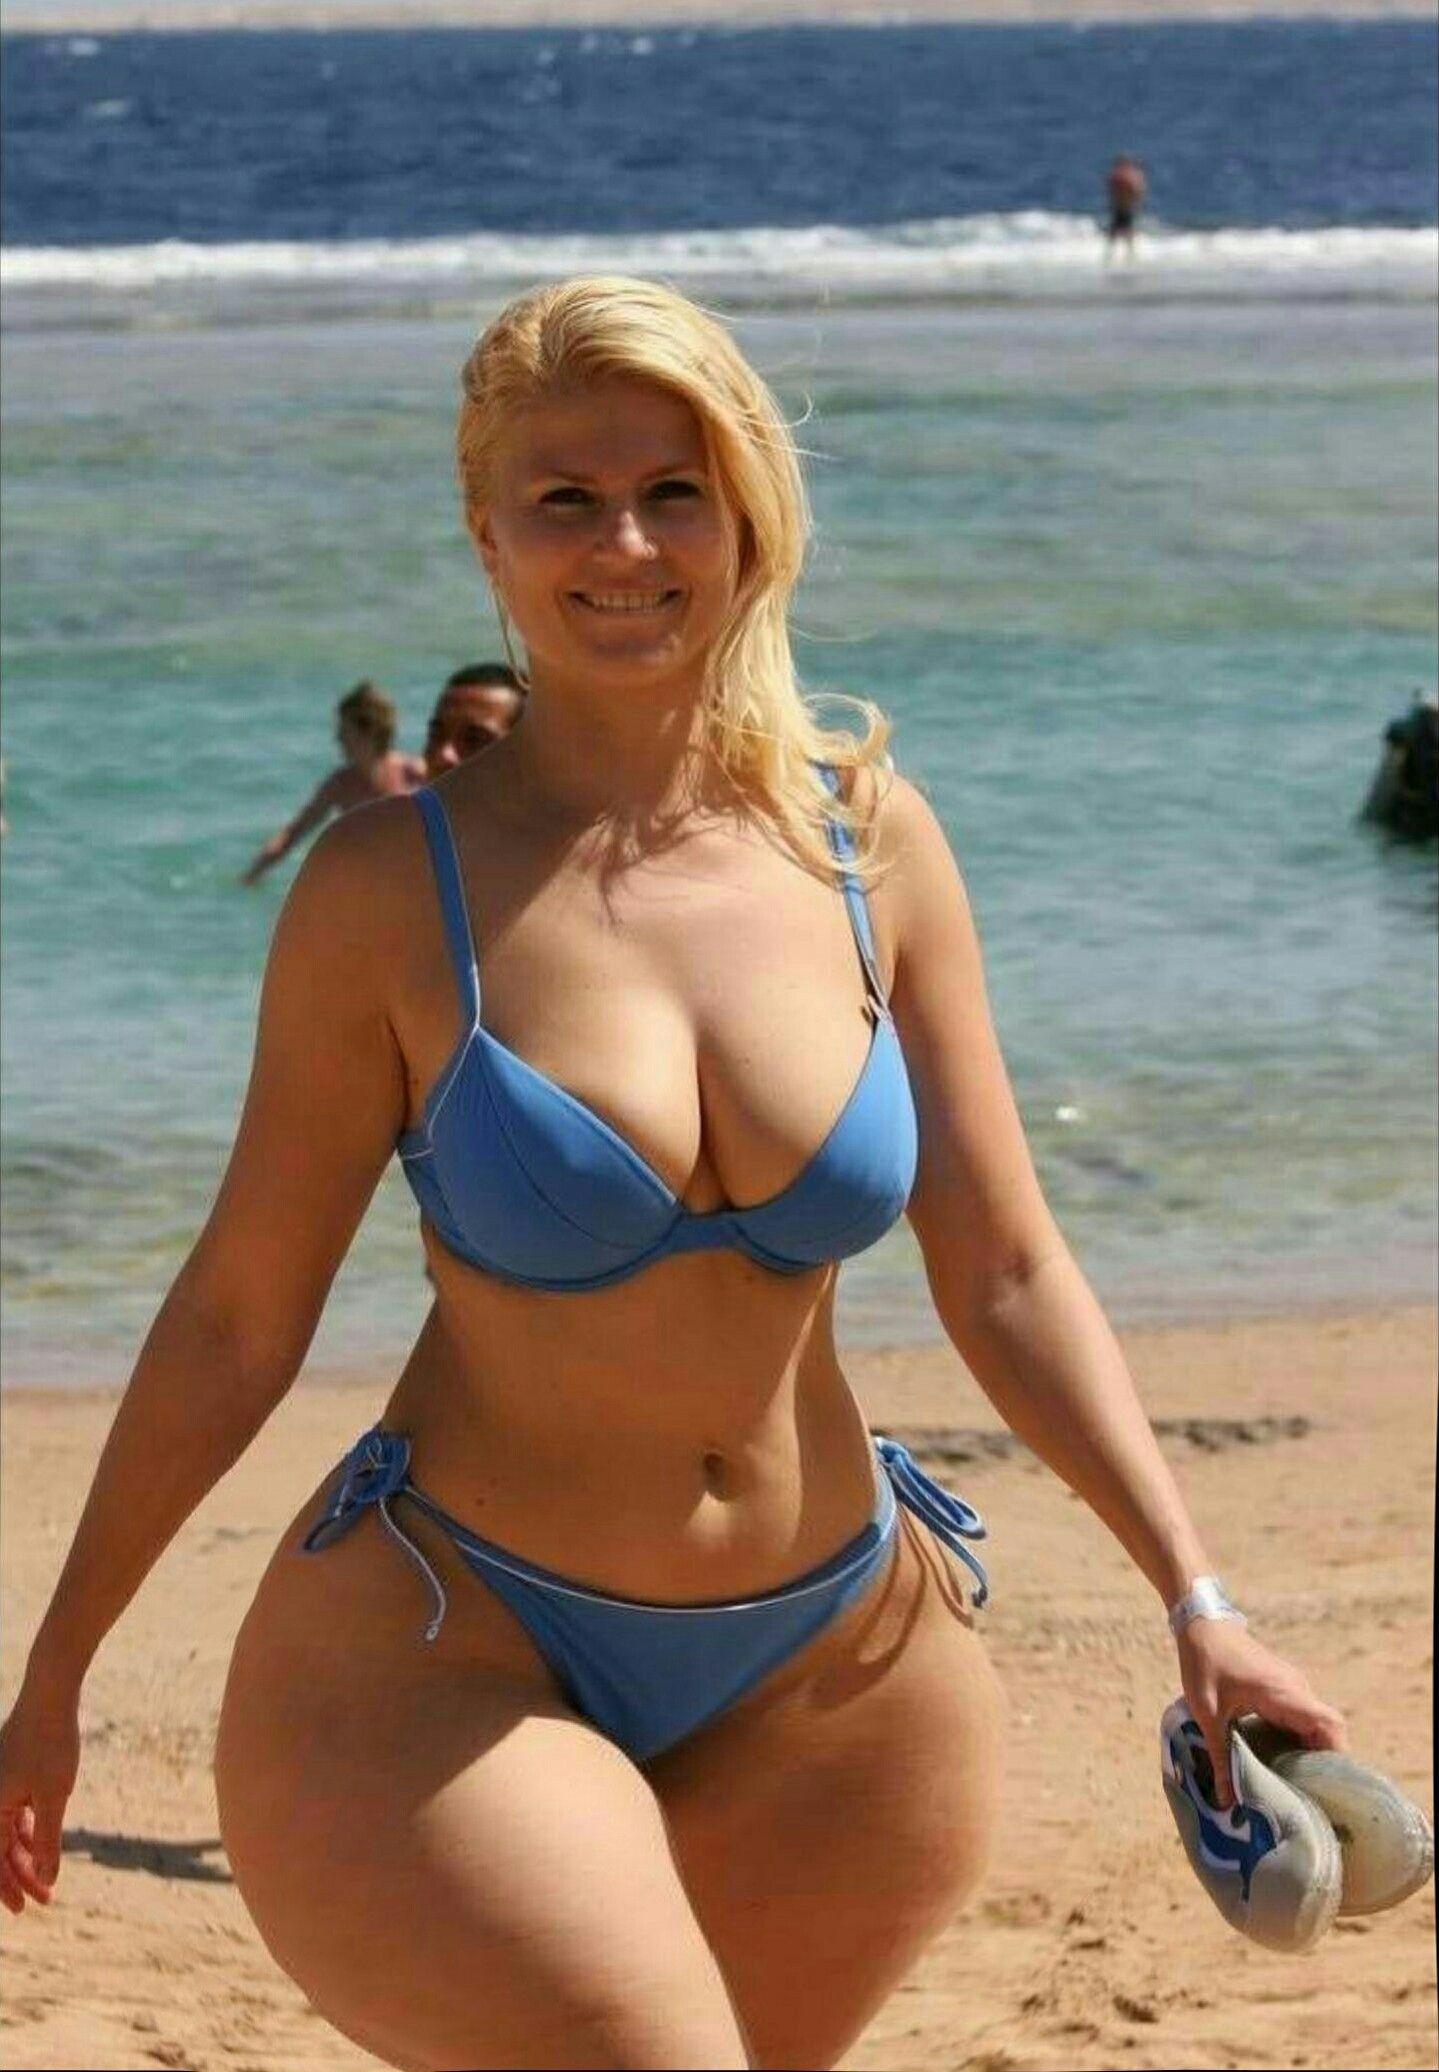 d67c56373545 Pin de Megaman smooth en ssbbw en 2019 | Bikini gordas, Mujeres ...